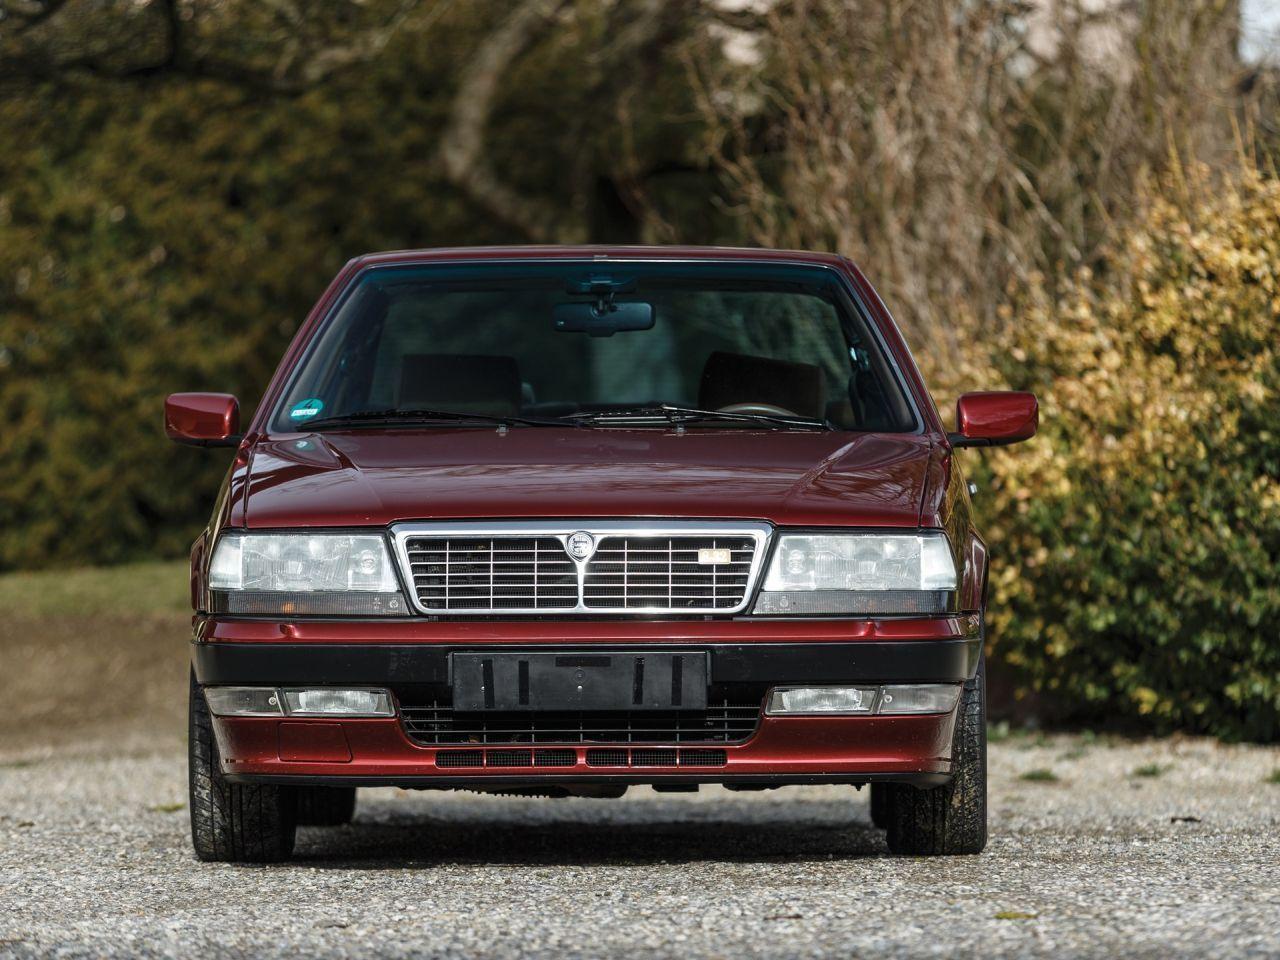 Lancia Thema 8.32 de 1991 - Costard, champagne... Et frustration ! 28